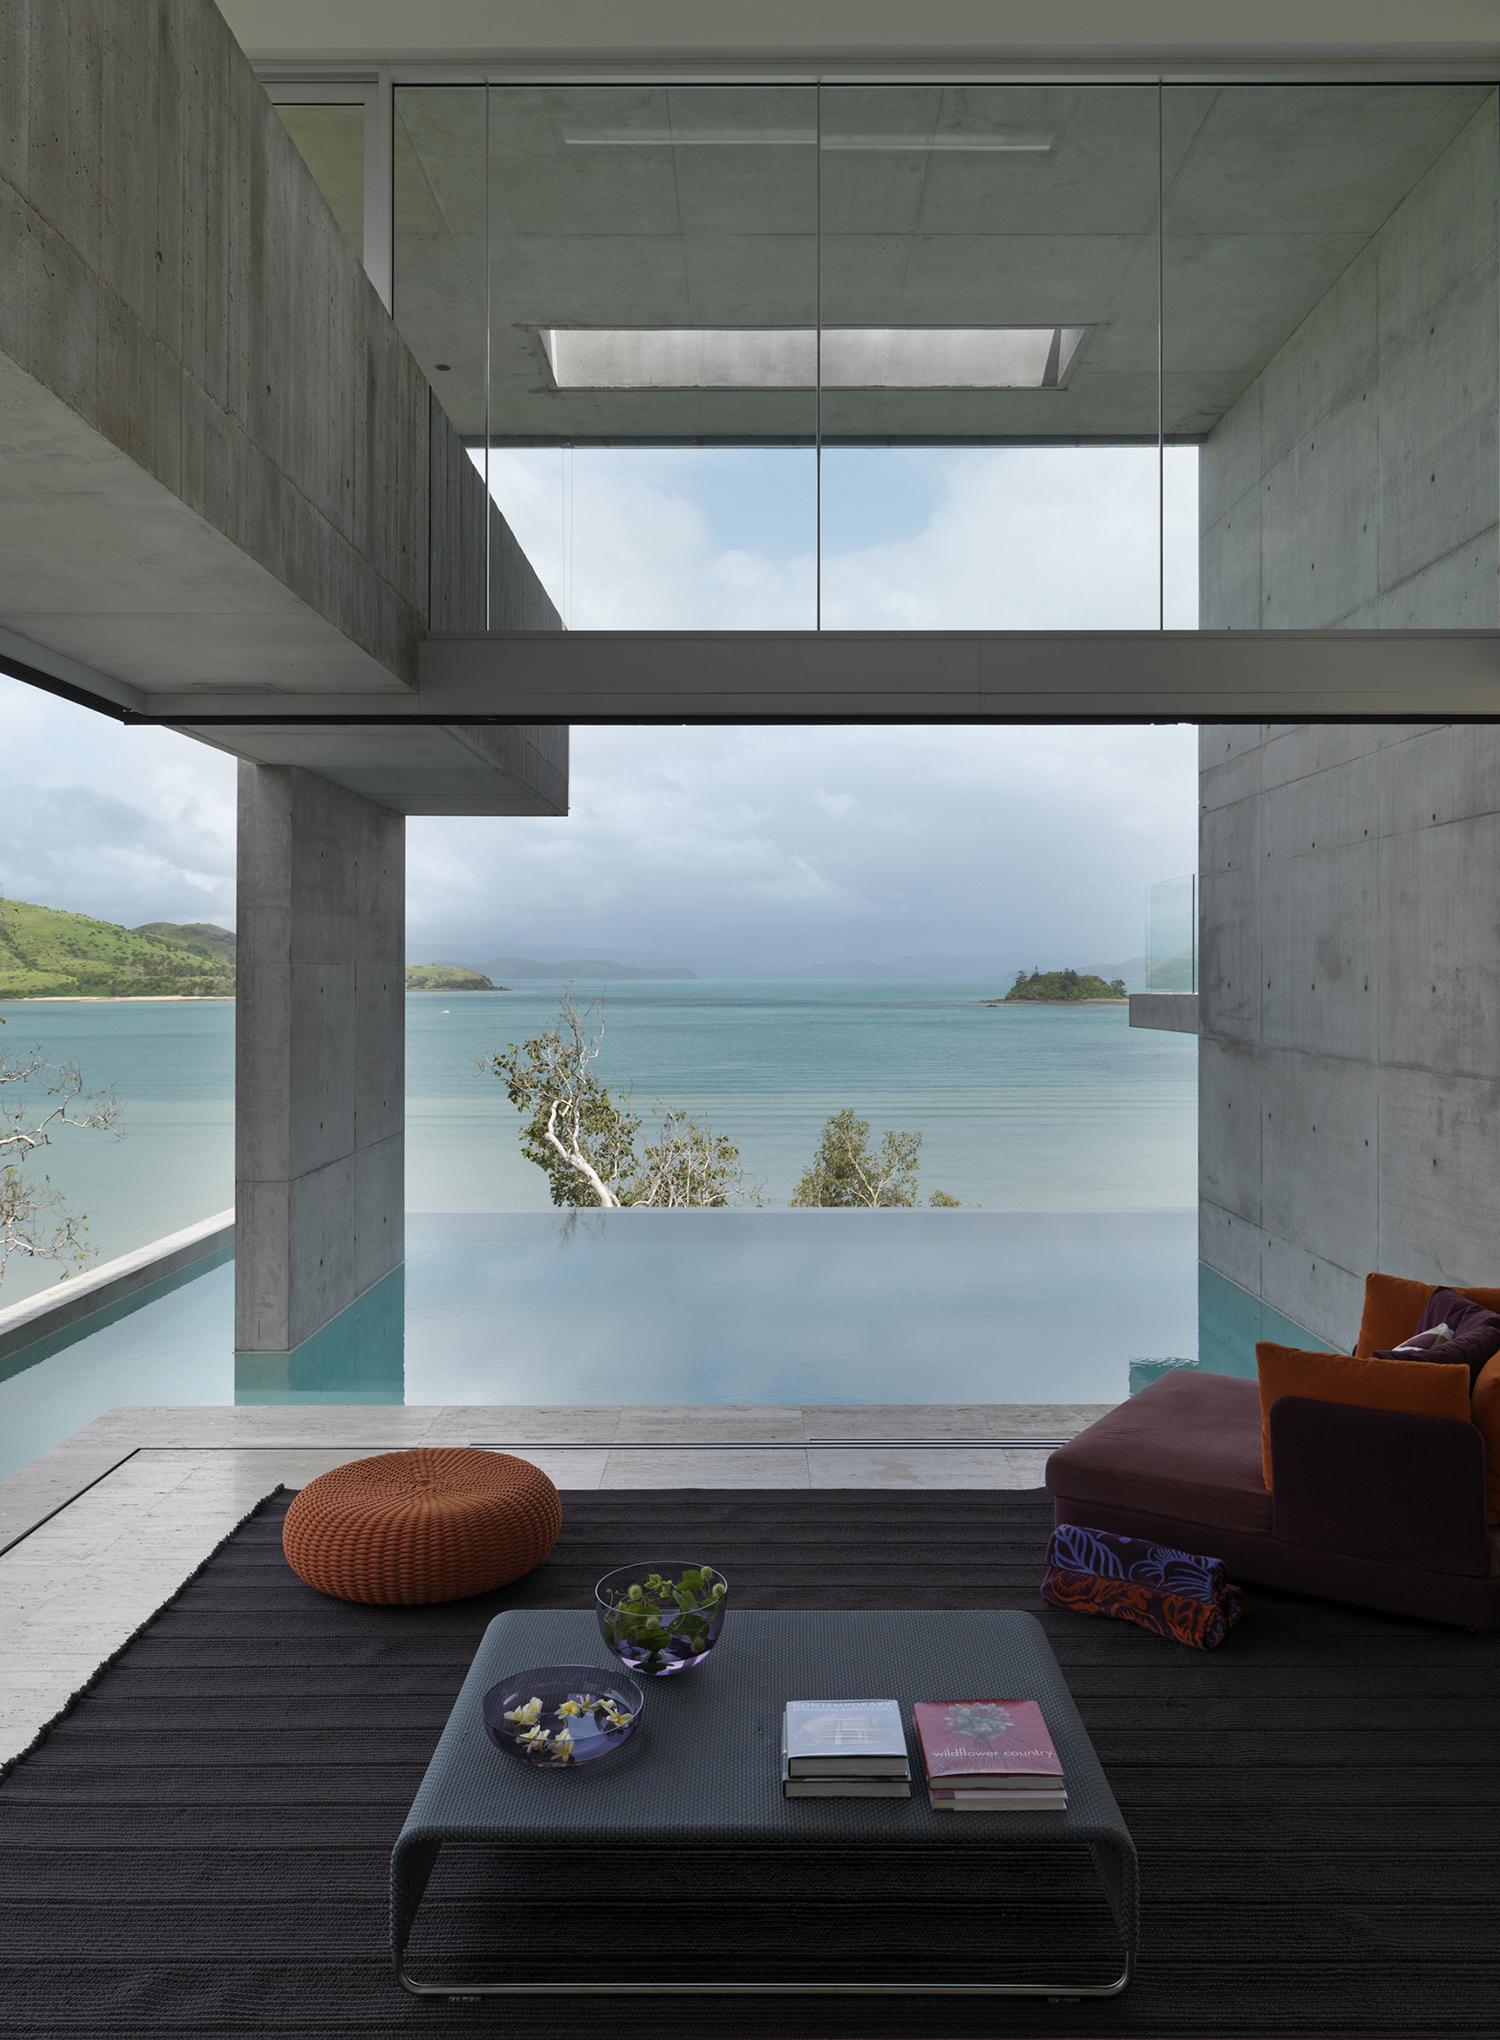 Solis House sitting room